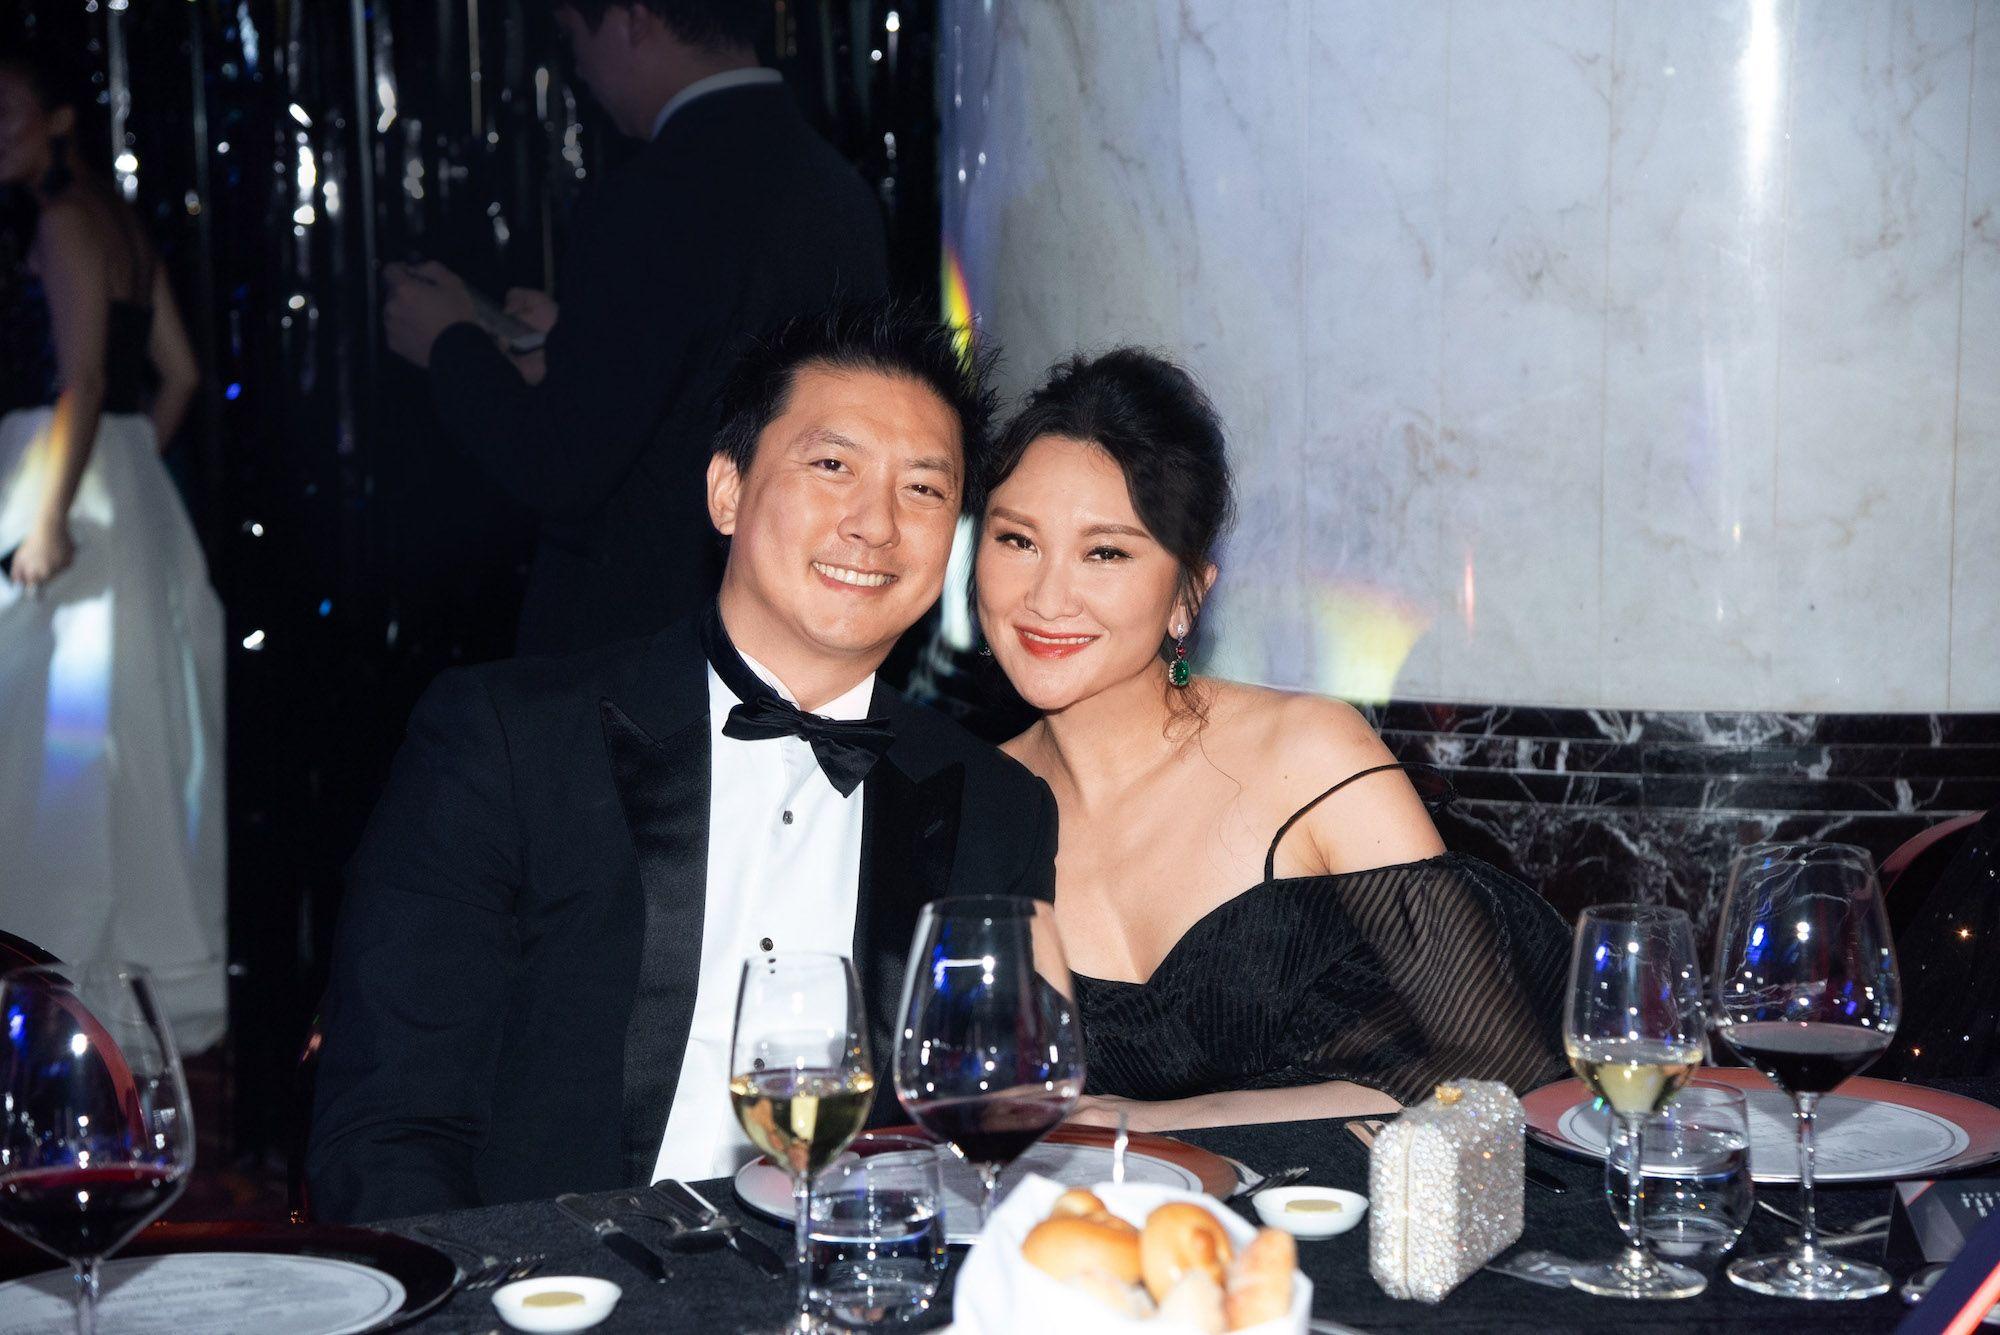 Michael Tung, Samantha Shek-Tung